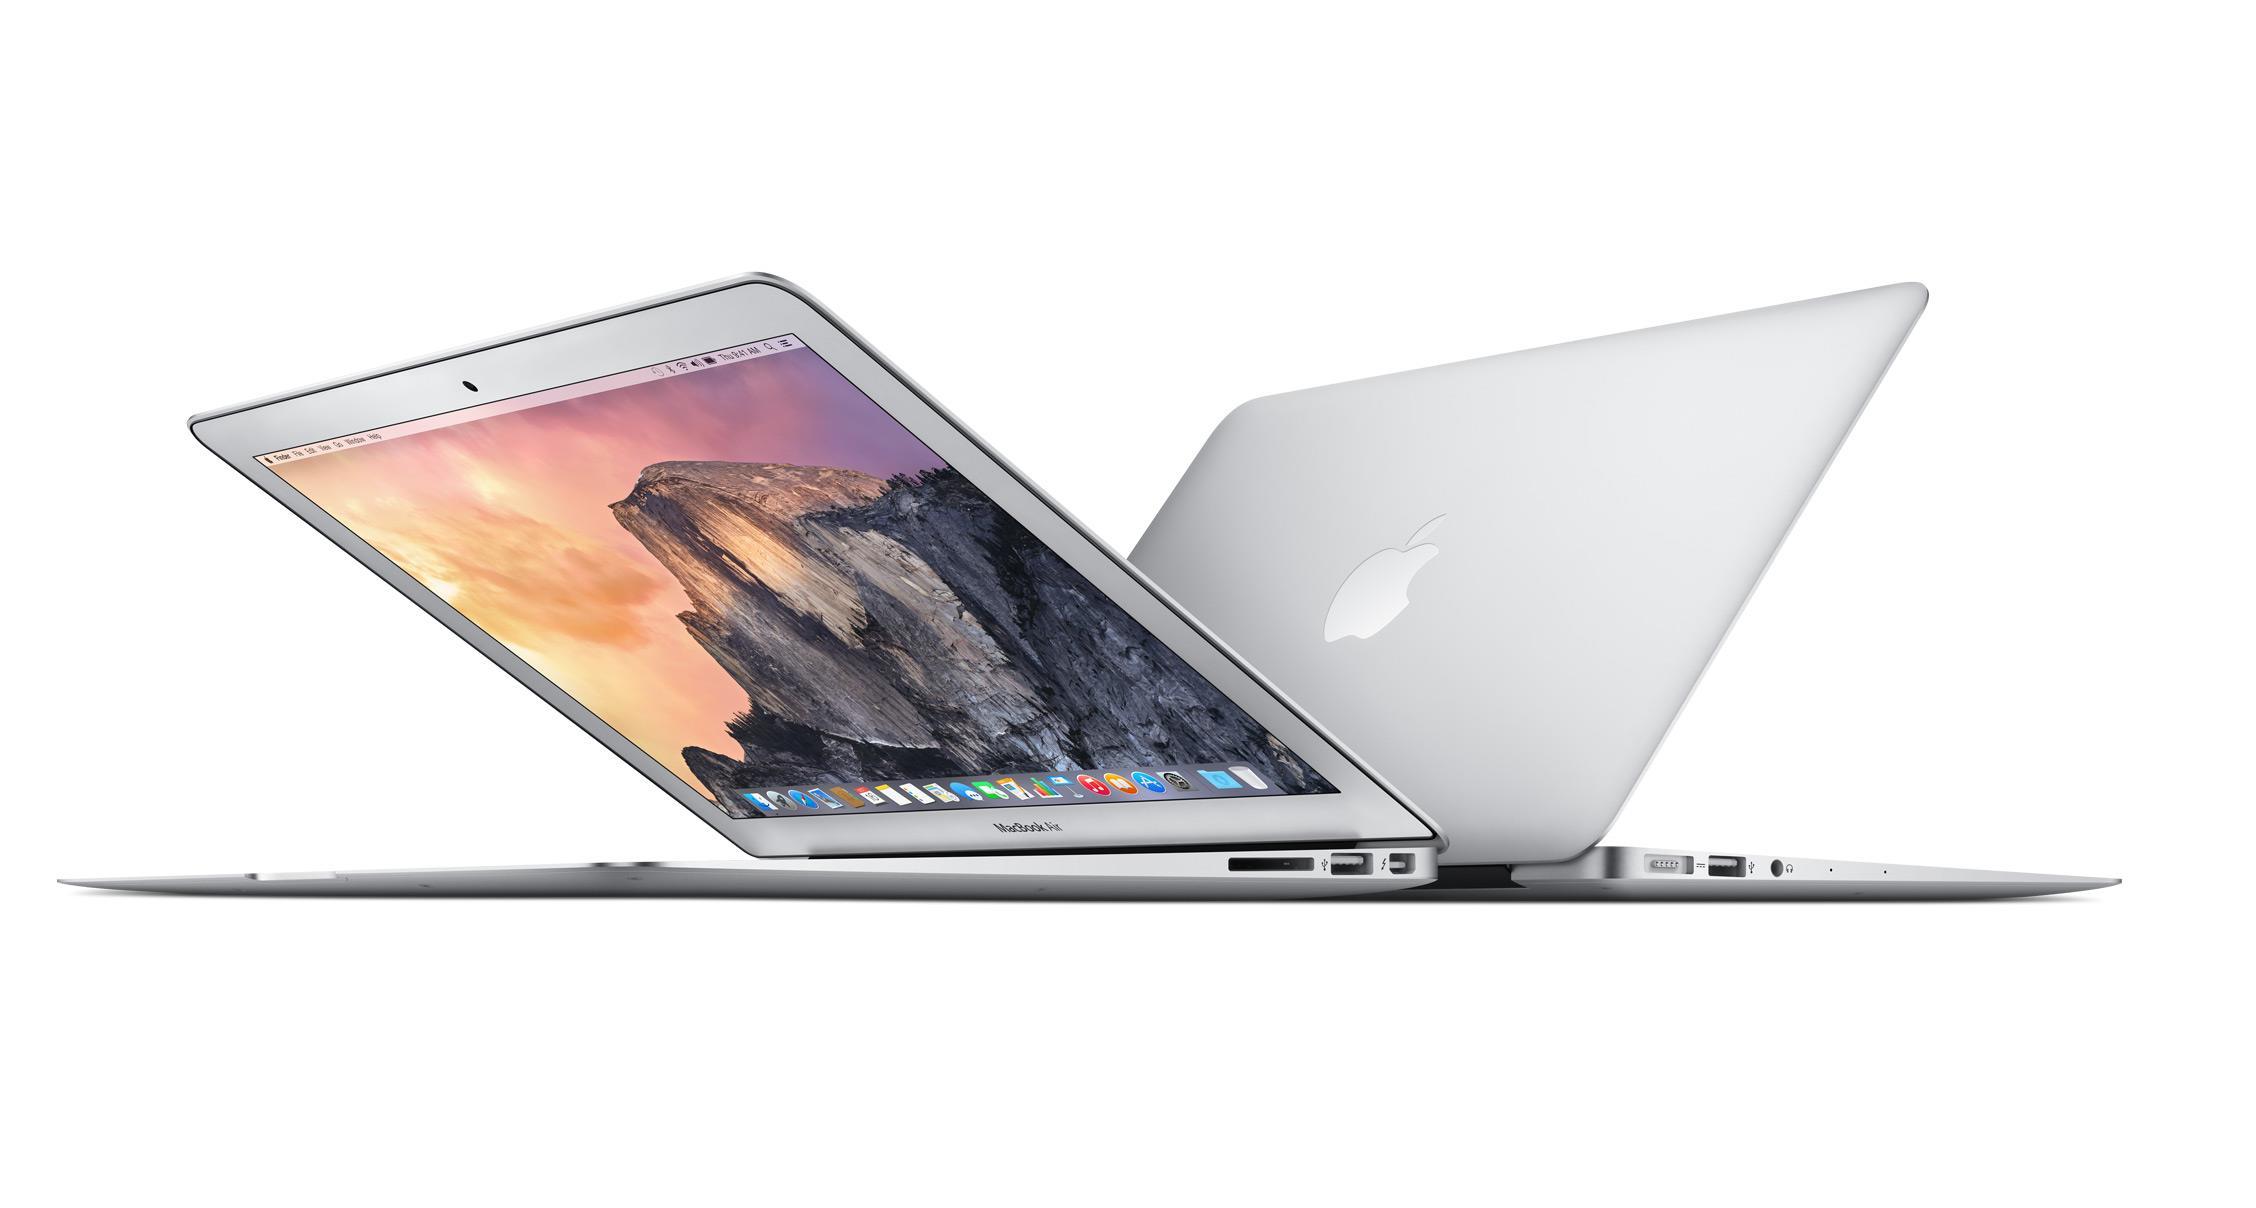 Bundle: Apple MacBook Air (11.6 inch) Netbook Core i5 (1.6GHz) 4GB 256GB Solid State Drive WLAN BT Webcam Mac OSX Yosemite (Intel HD Graphics 6000) + MS